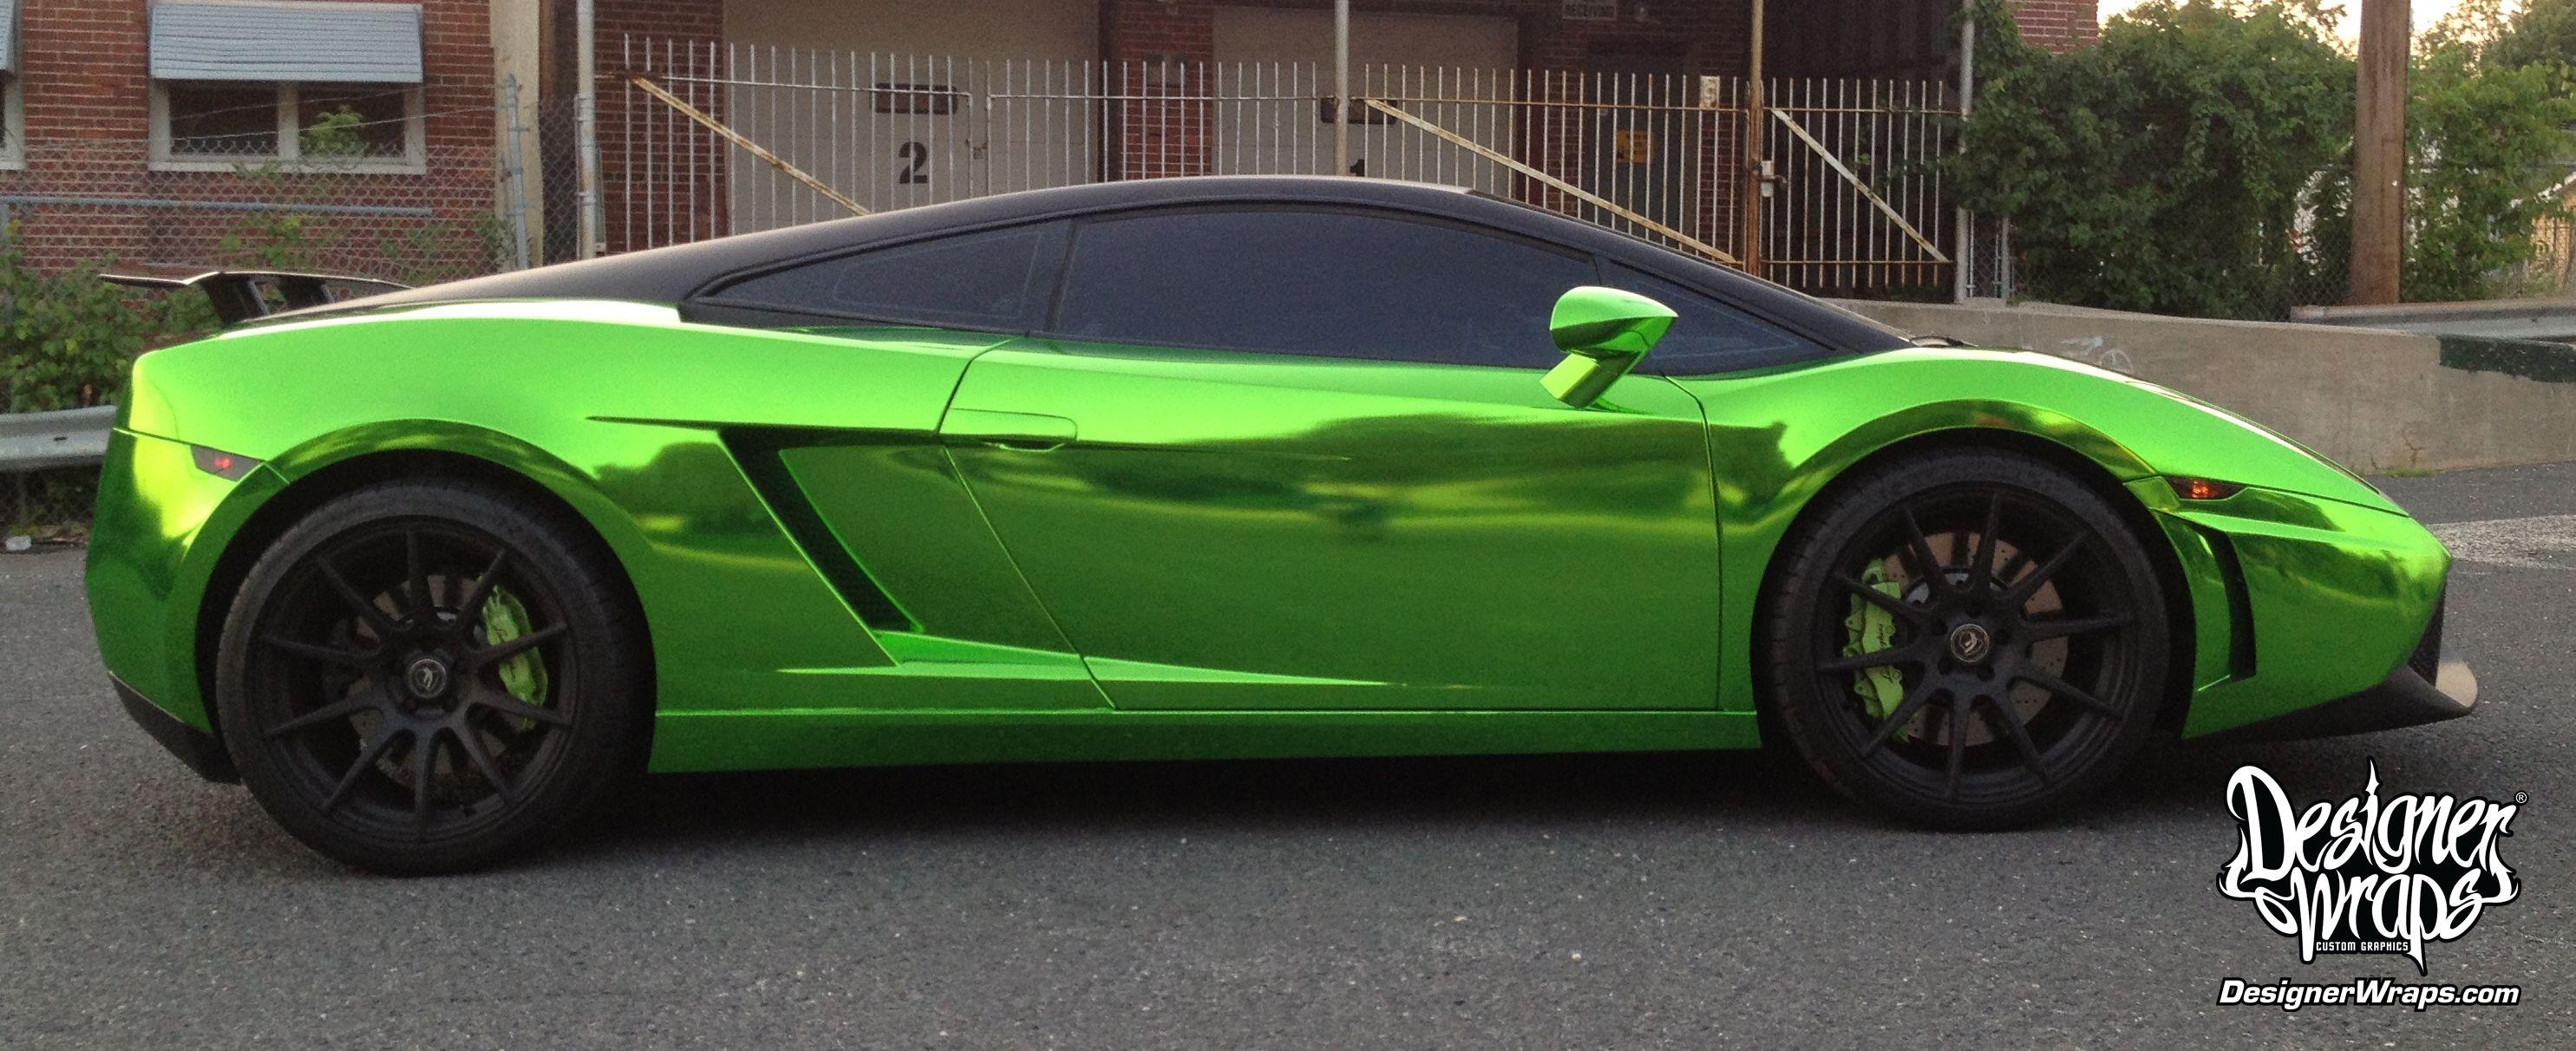 Green Chrome Lamborghini Gallardo